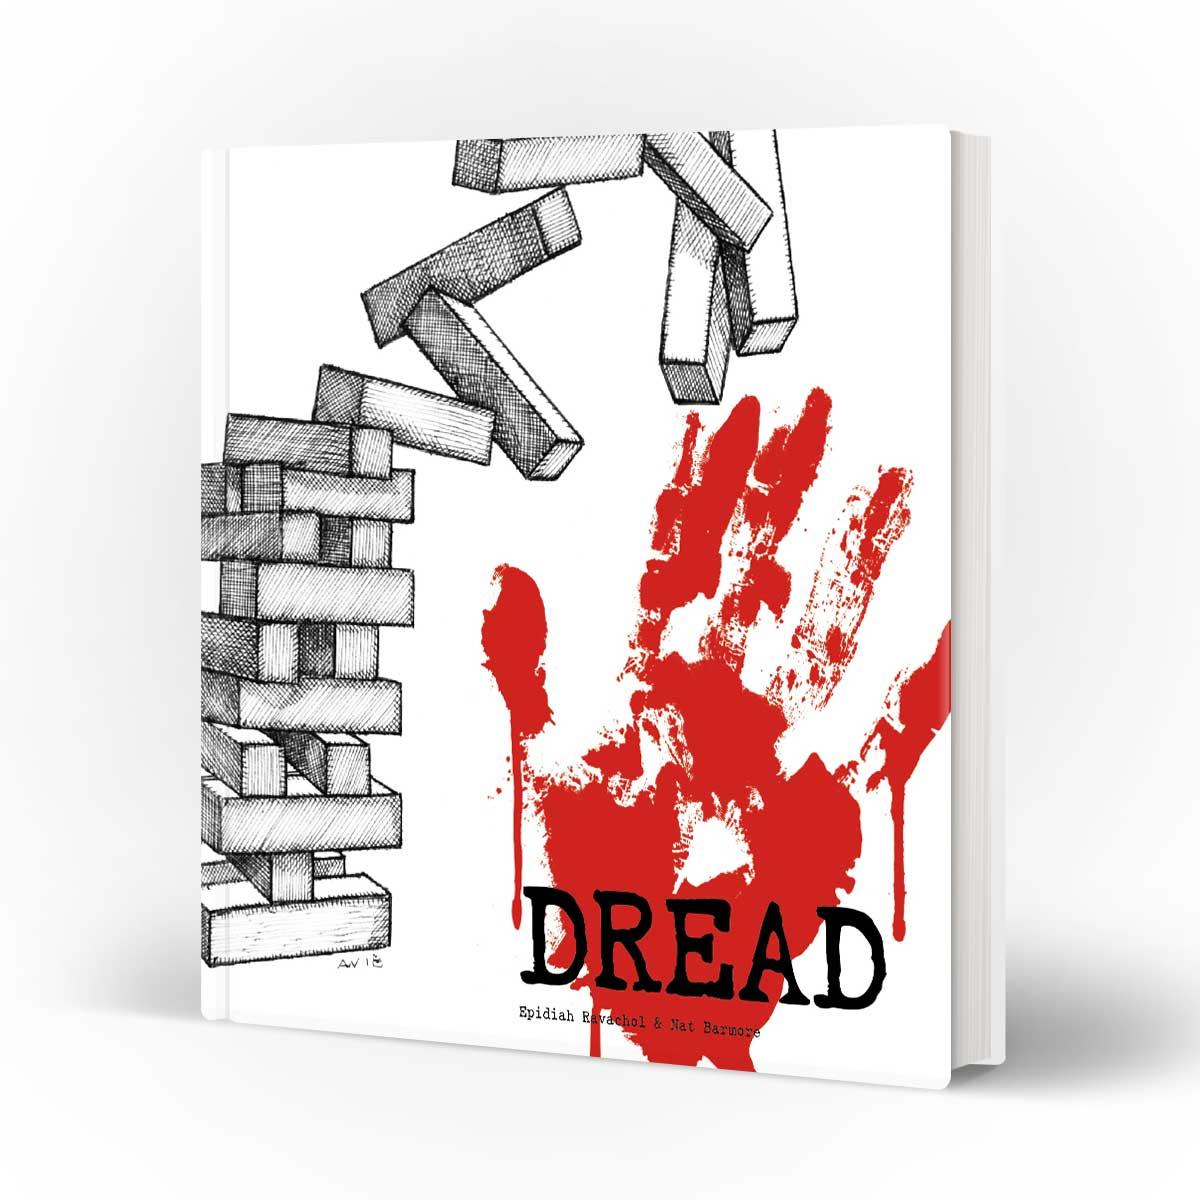 Dread-System-Matters-Verlag